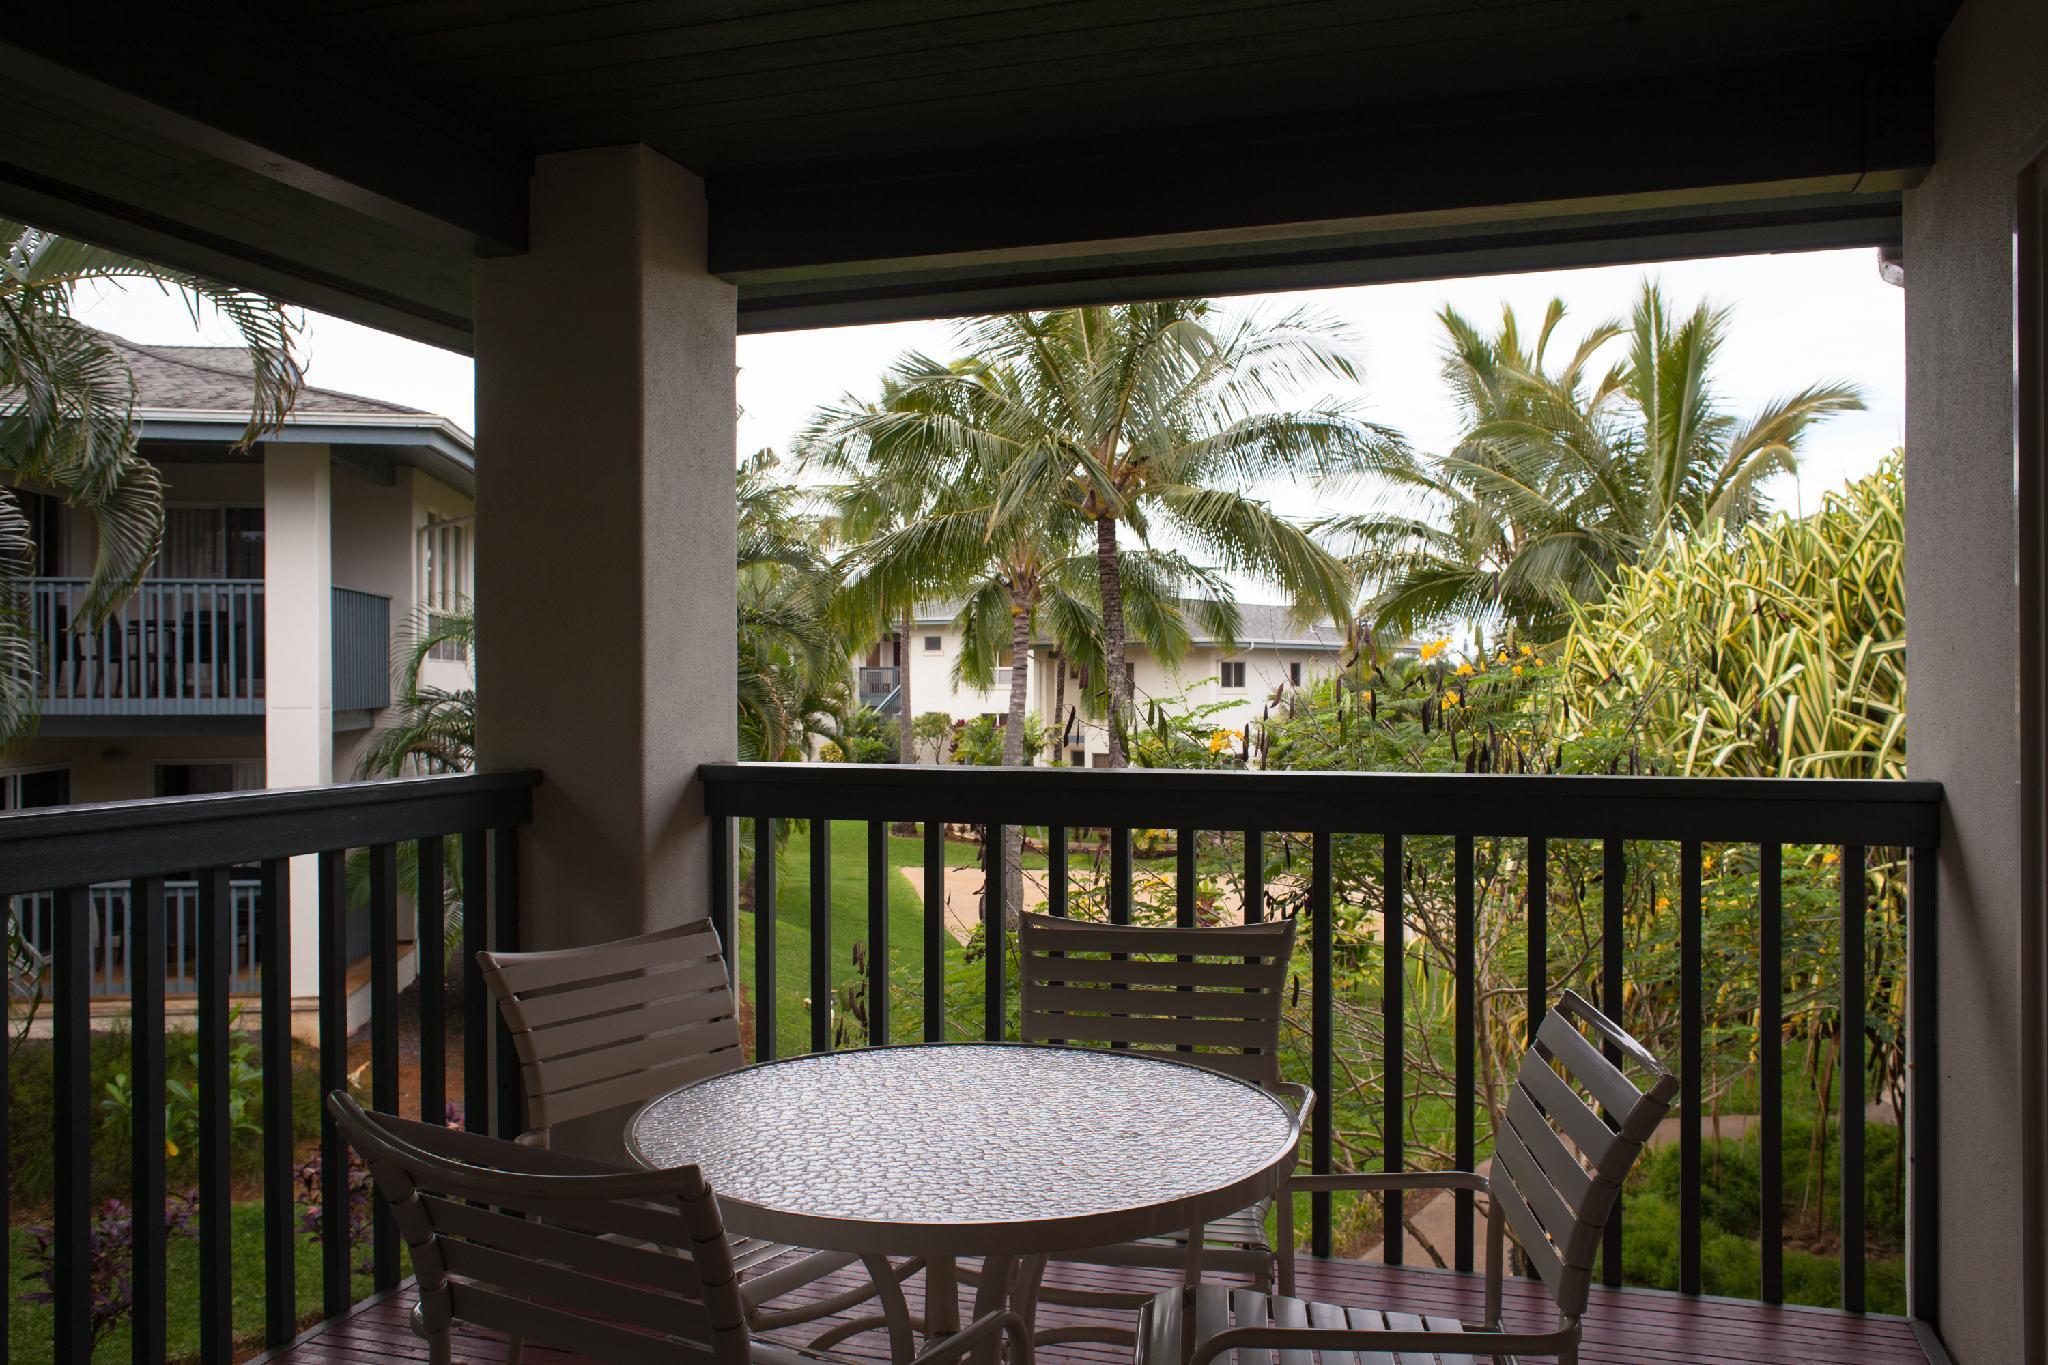 Bali Hai Villas Resort By Resortshare Kalihiwai Hi United States Photos Room Rates Promotions